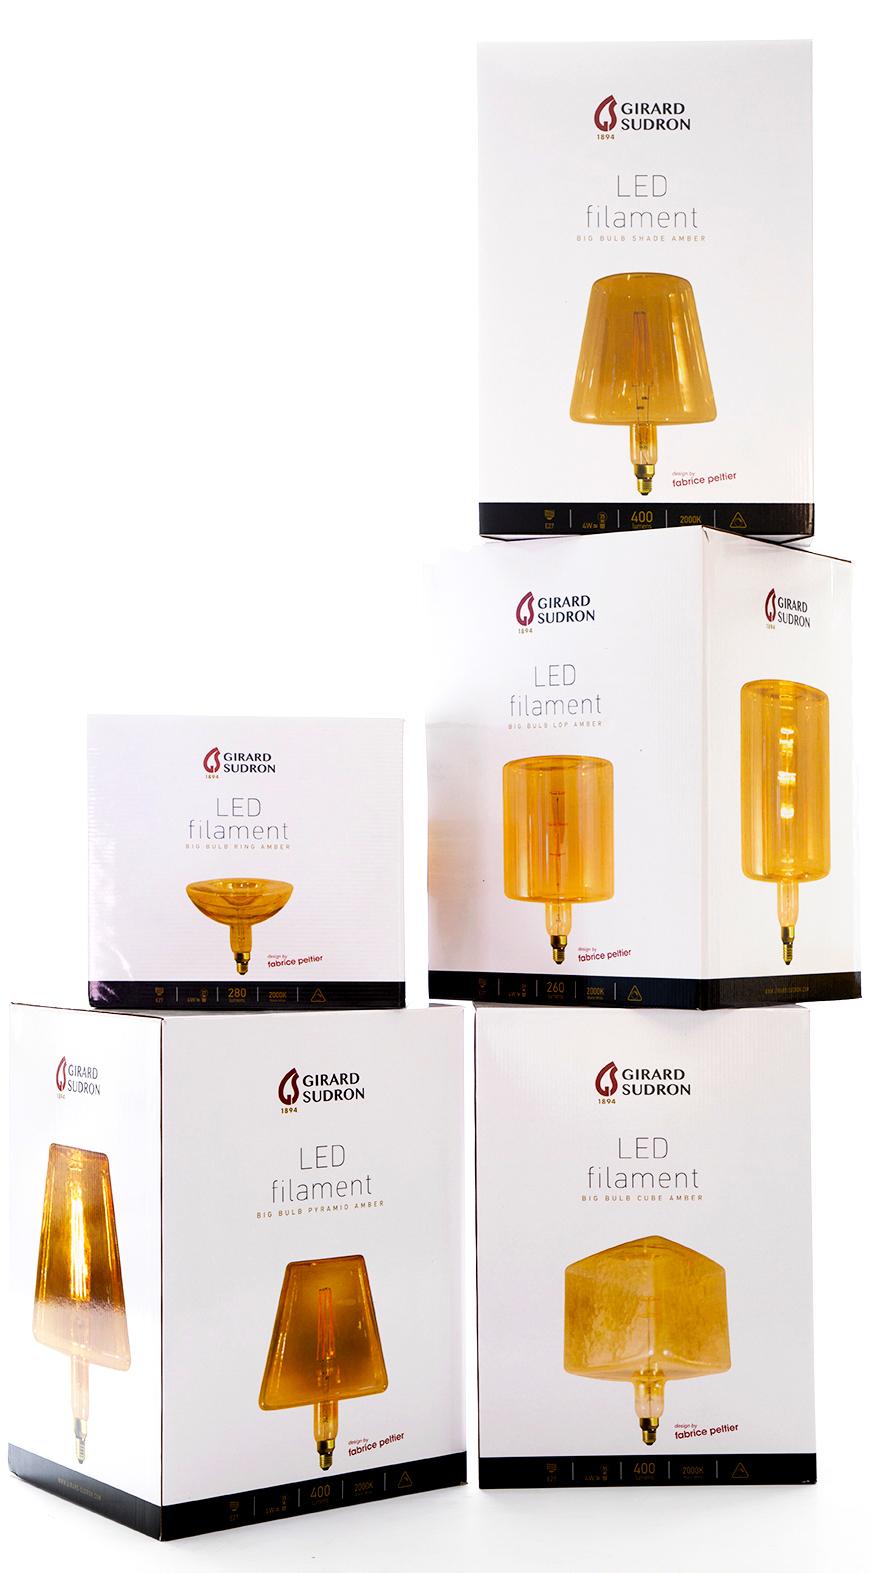 Fabrice Peltier - Lampes geantes Girard Sudron